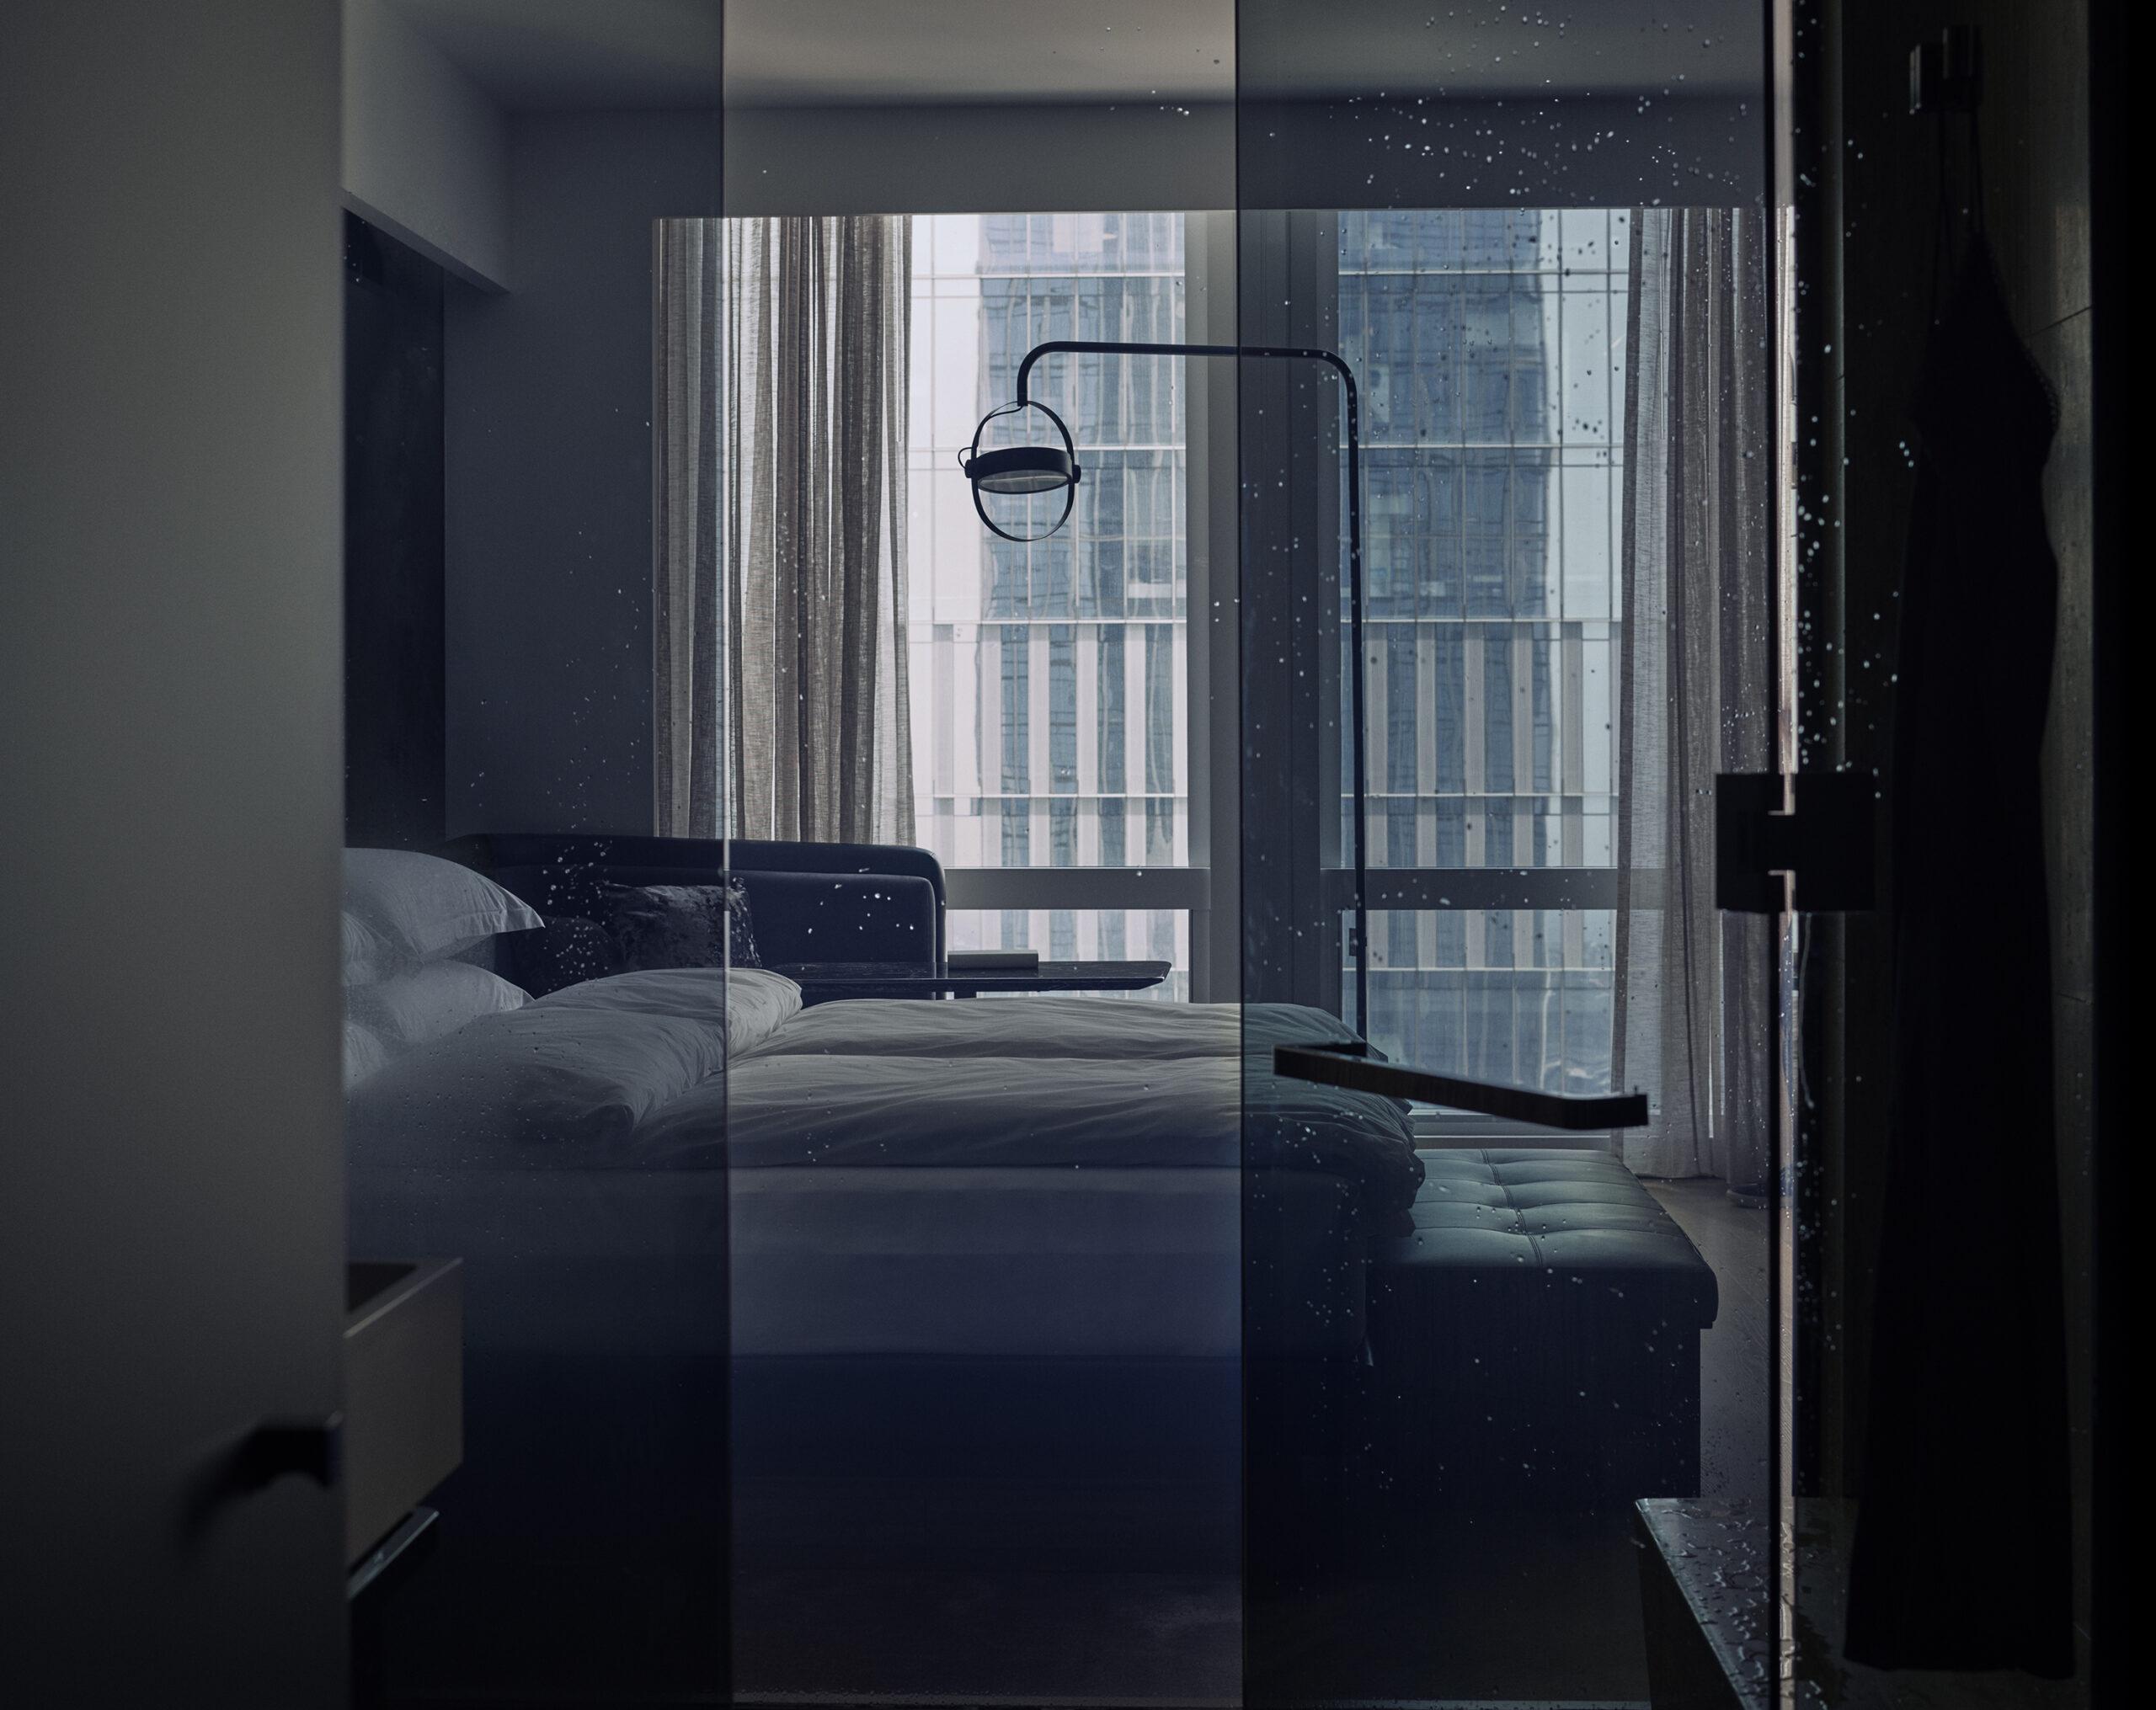 DeluxeKingCity-Room-Bathroom-Shower-Day-1-scaled